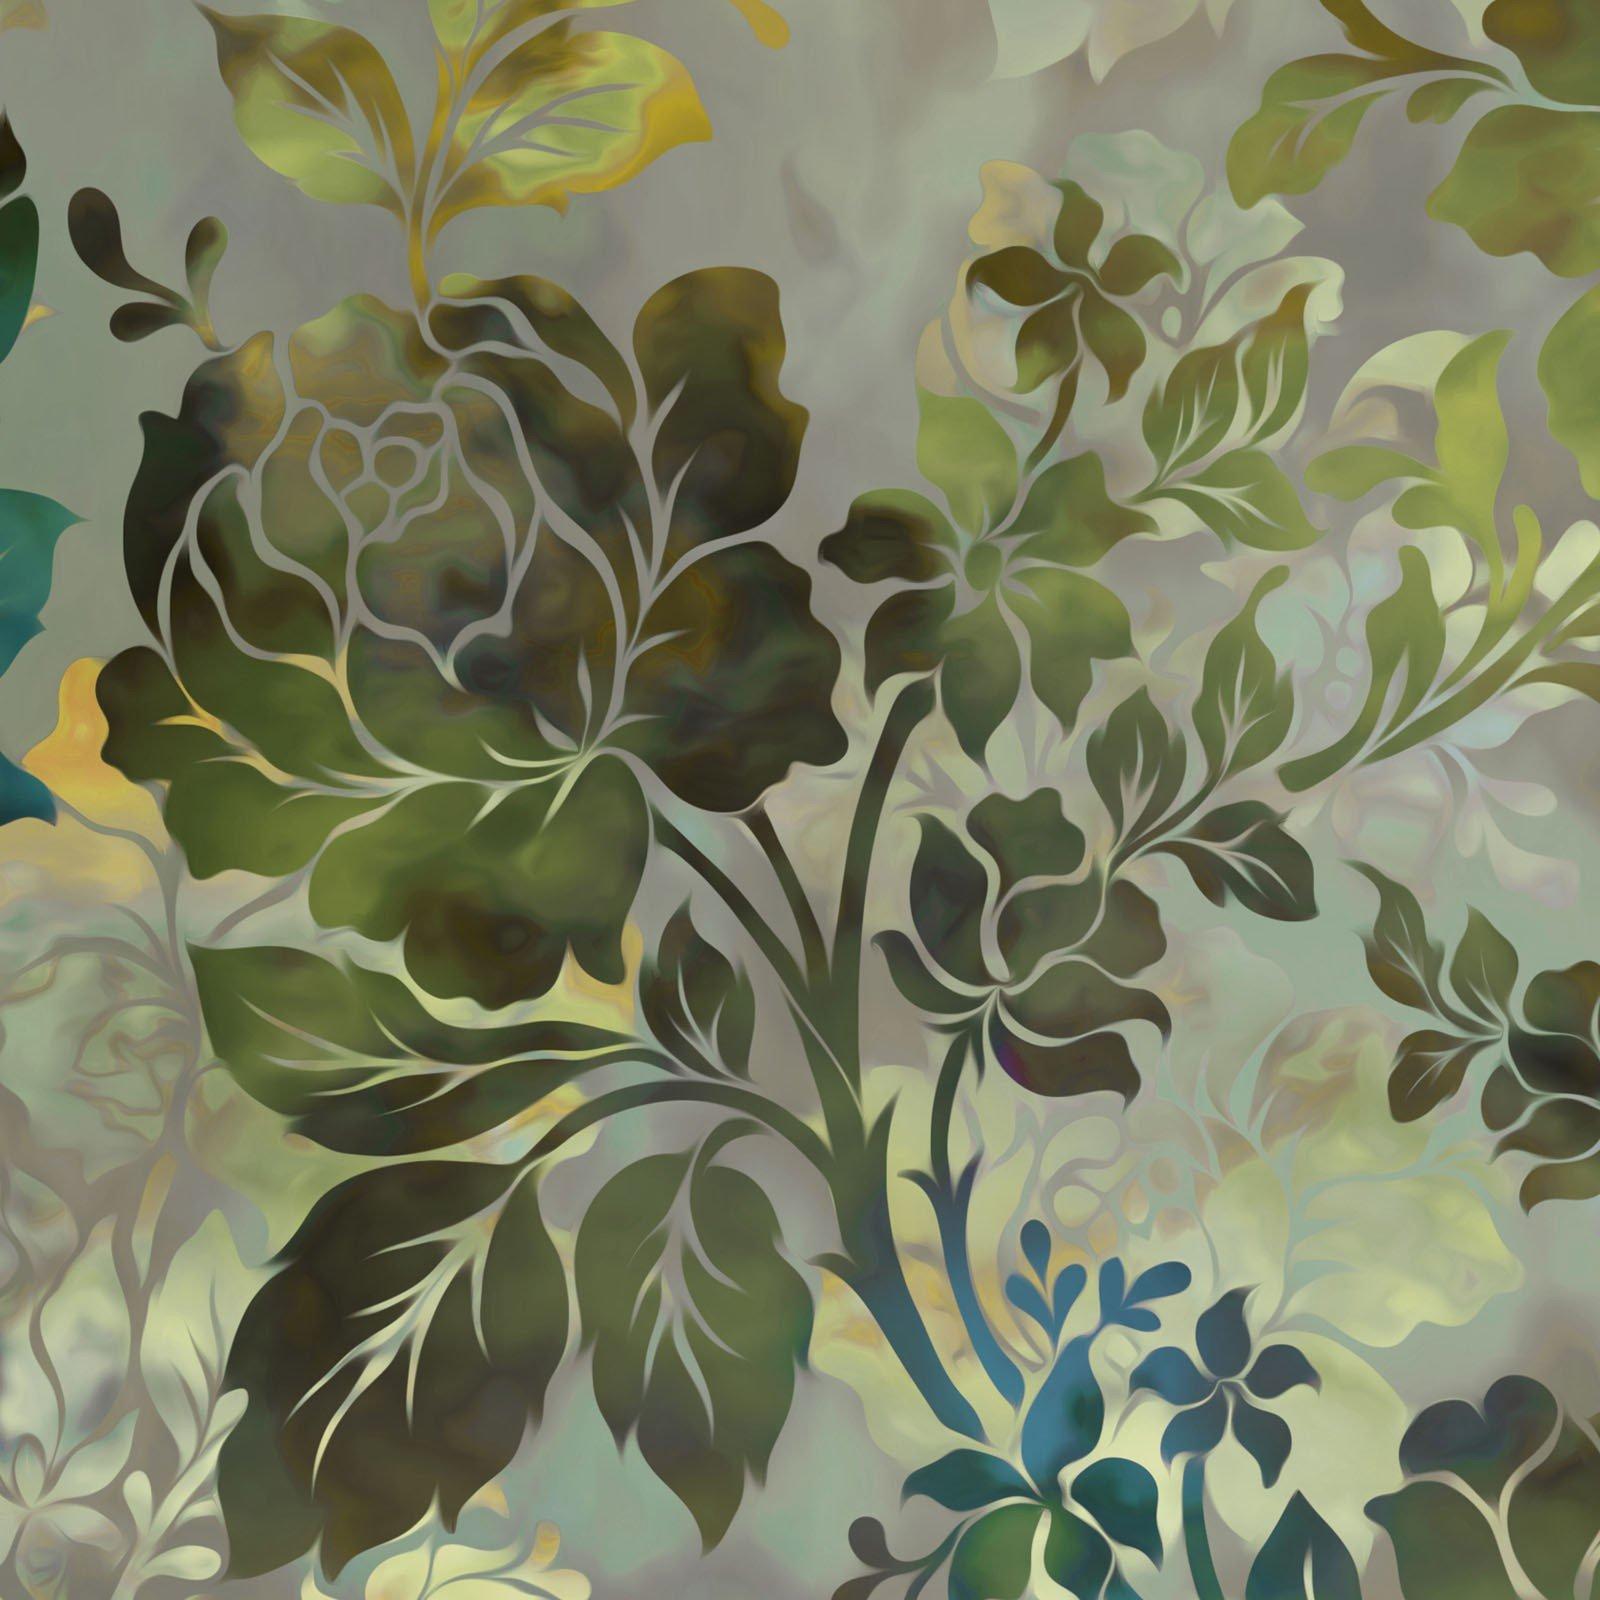 Diaphanous 1ENC-3 Leaf Night Bloom